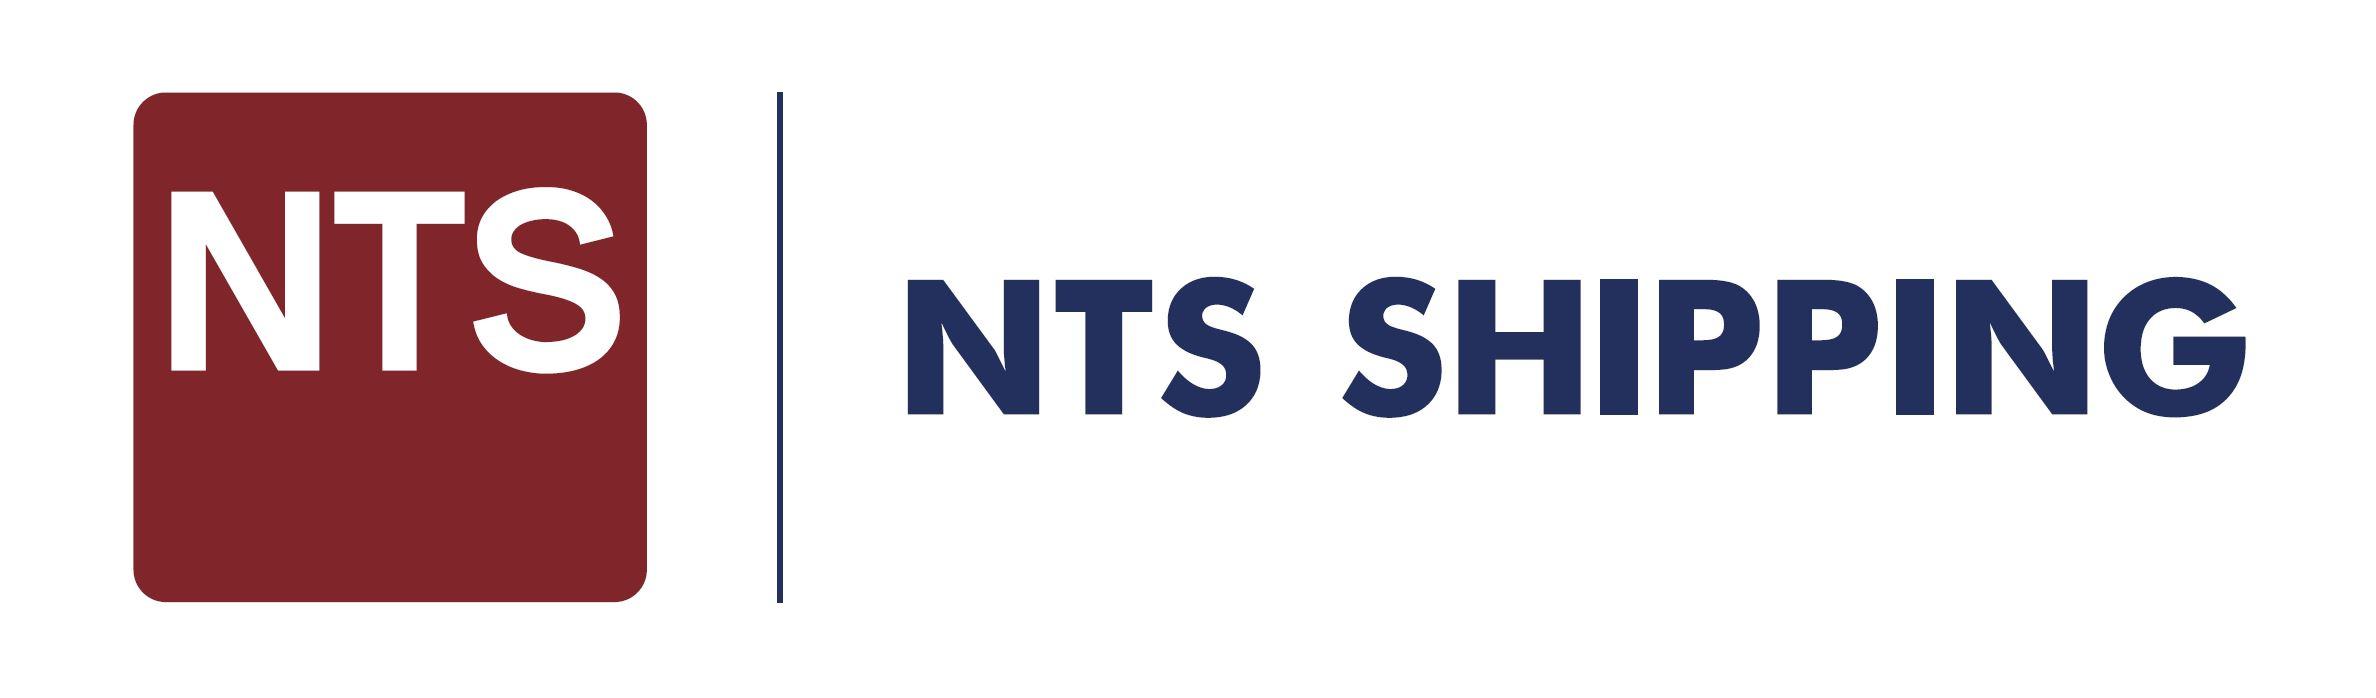 NTS SHIPPING